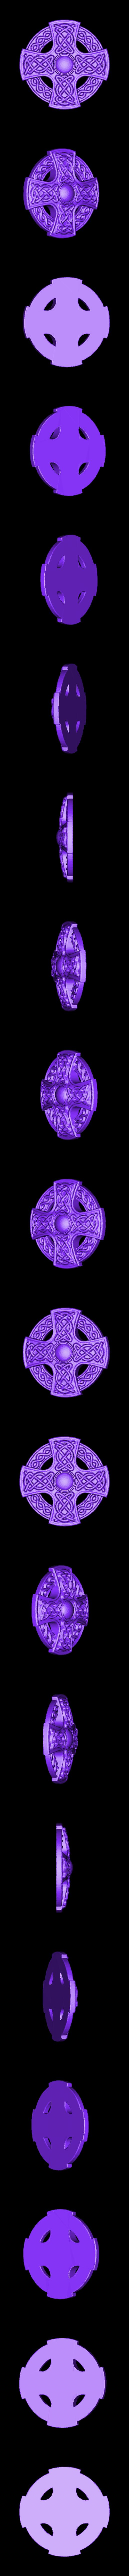 CREST.stl Download free STL file Celtic cross • 3D printing model, shuranikishin